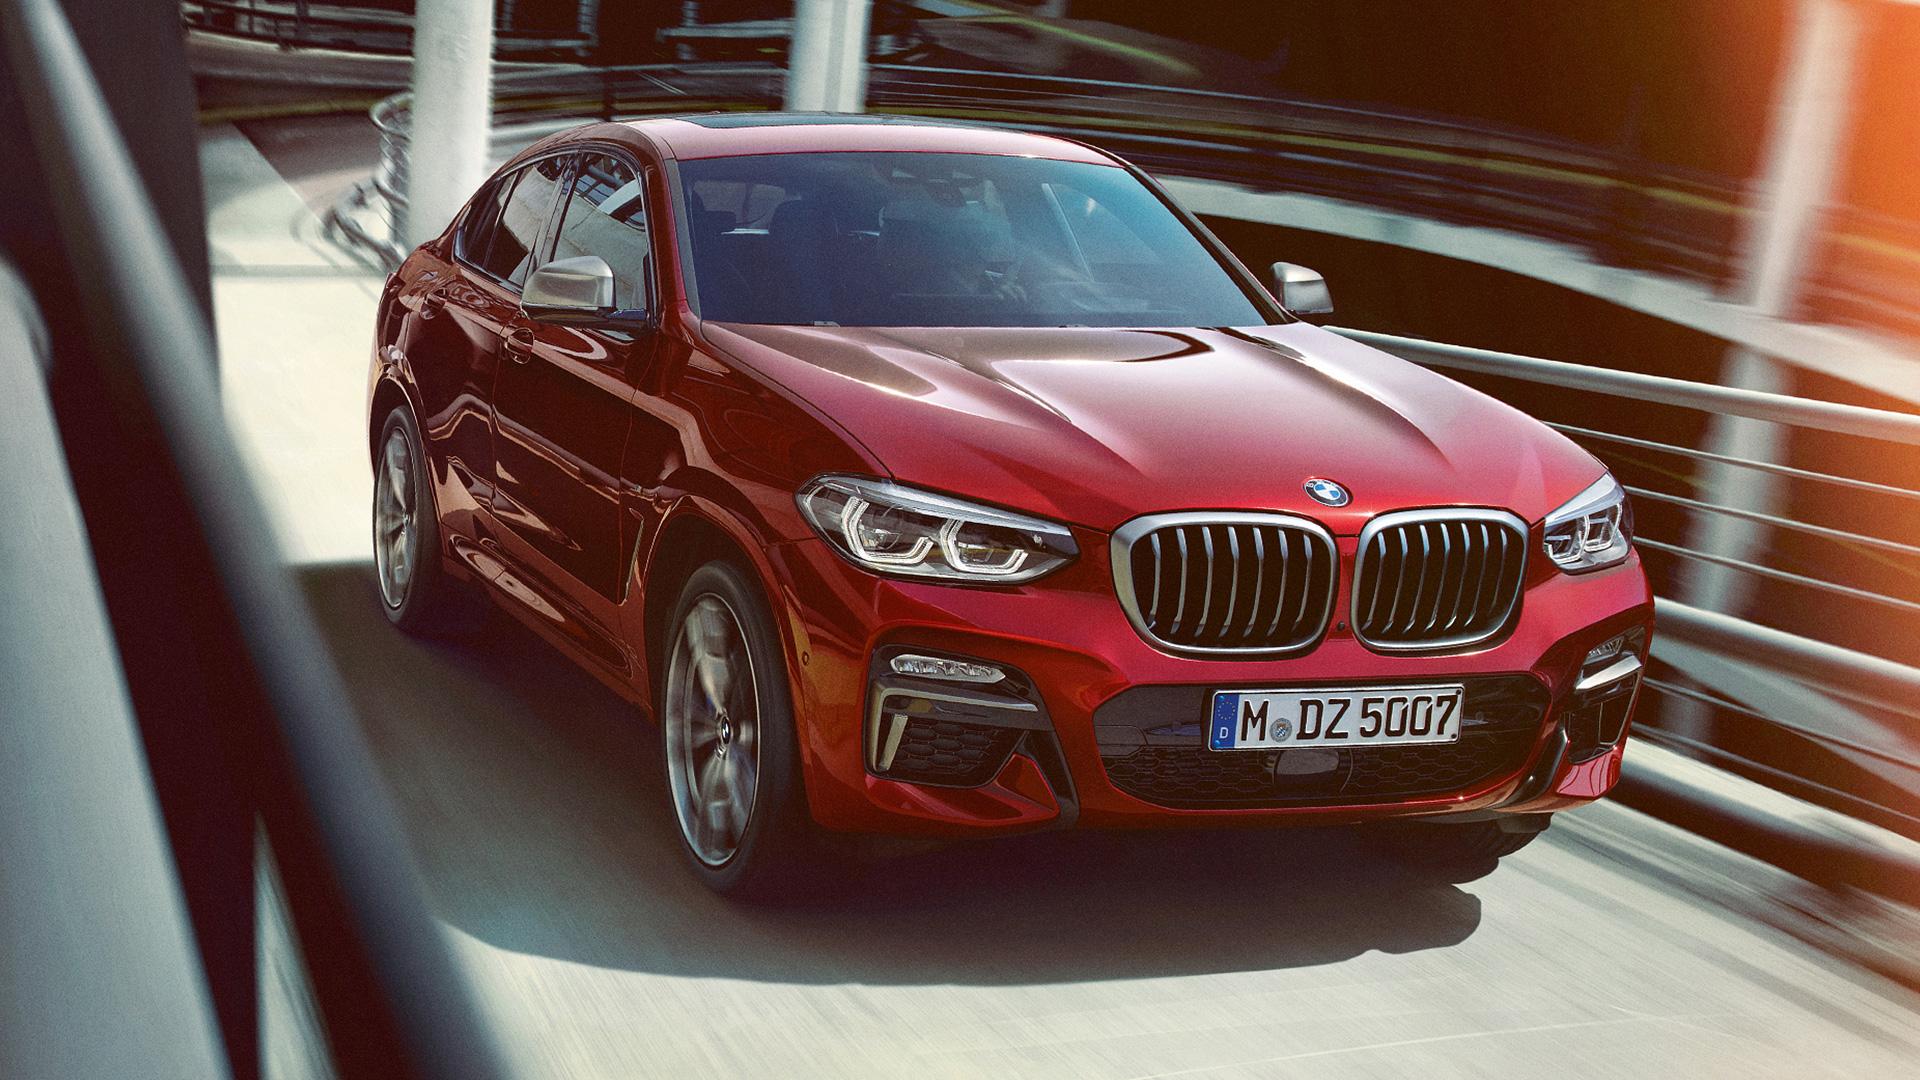 BMW X4 coupe 2019 xDrive30d M Sport X Exterior